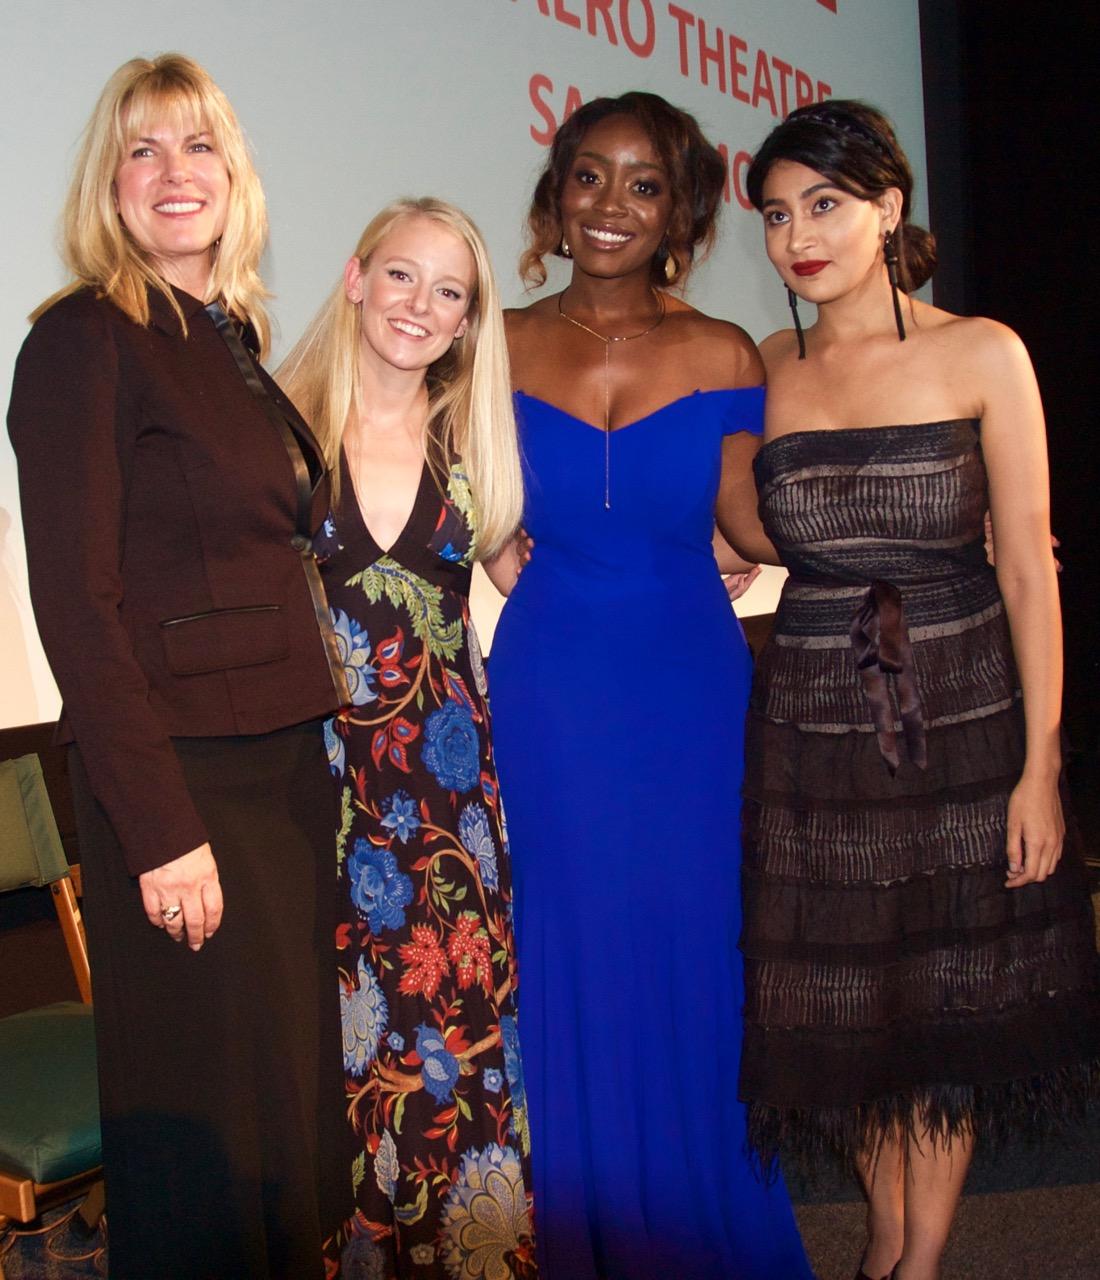 left to right: Conroy Kanter, Producer, Kelly Washington, Jessica Obilom, Alpa Banker